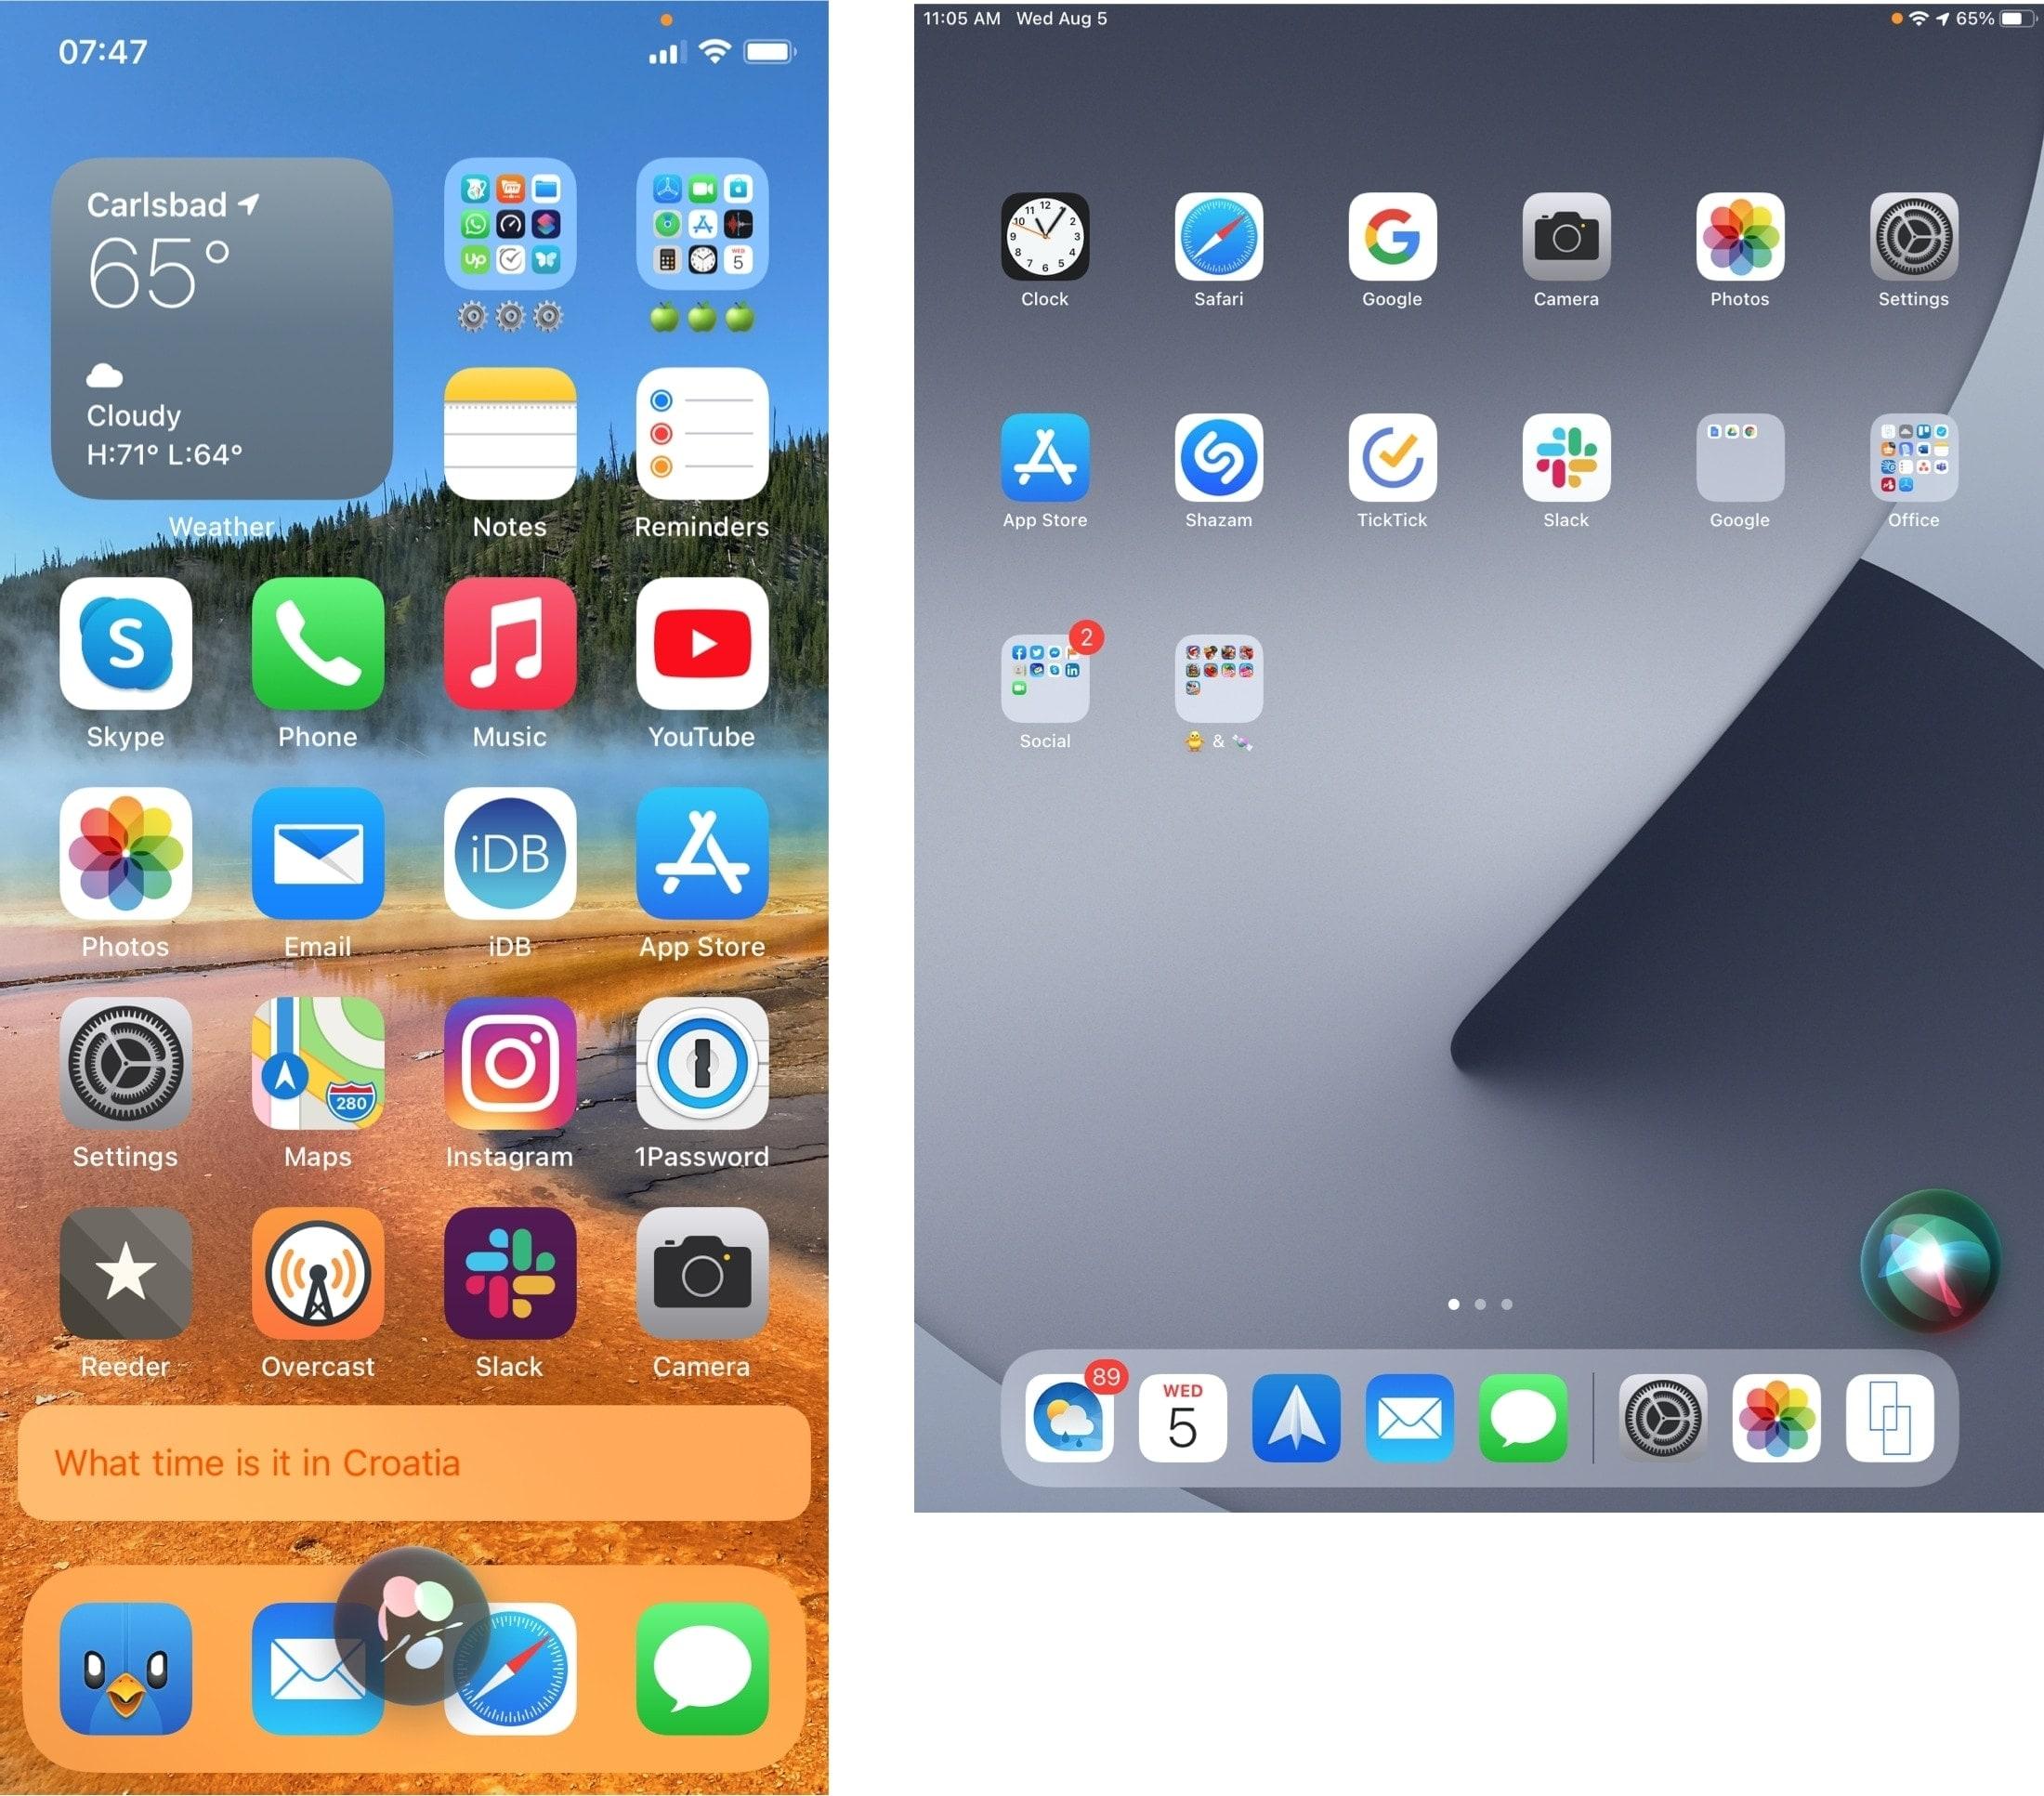 Compact Siri on iPhone and iPad